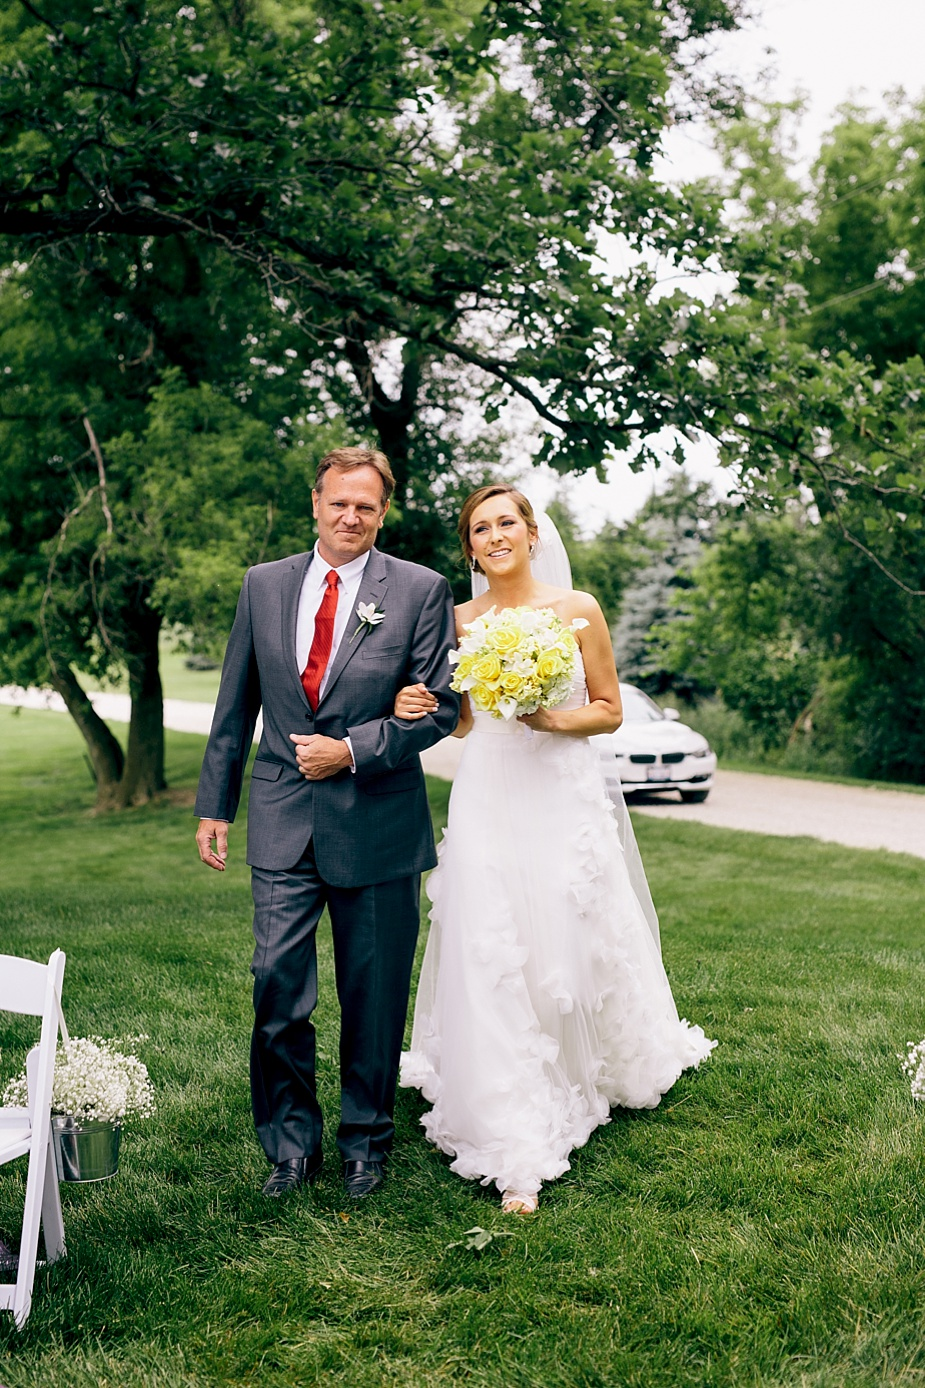 Alex+Becky-Lakeside-Backyard-Wedding_Milwaukee_Wedding_Photographer_0030.jpg